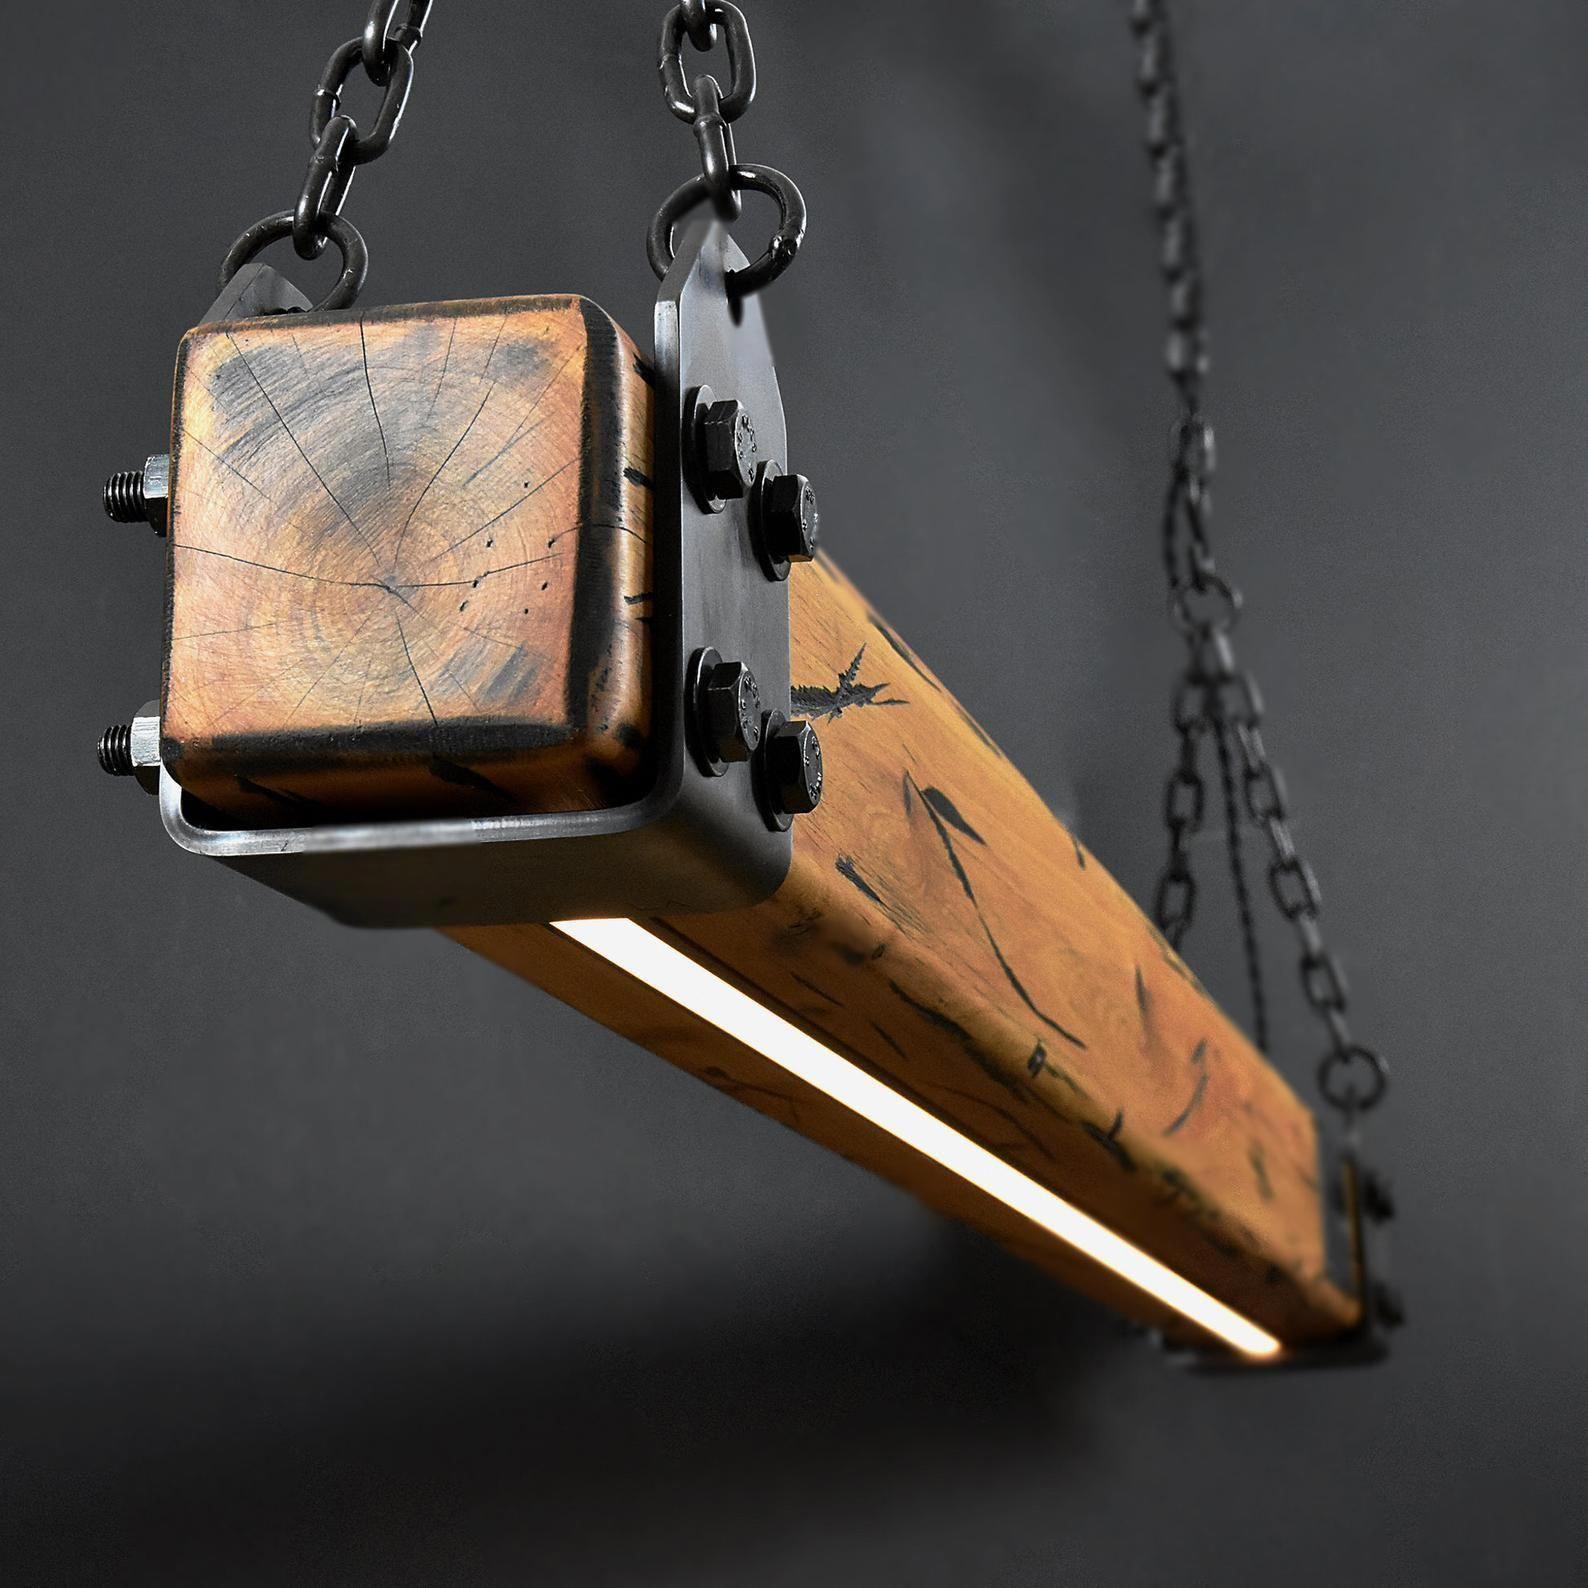 Wood Beam Led Pendant Light No 2 Industrial Wood Pendant Etsy In 2020 Led Pendant Lights Linear Lighting Industrial Wood